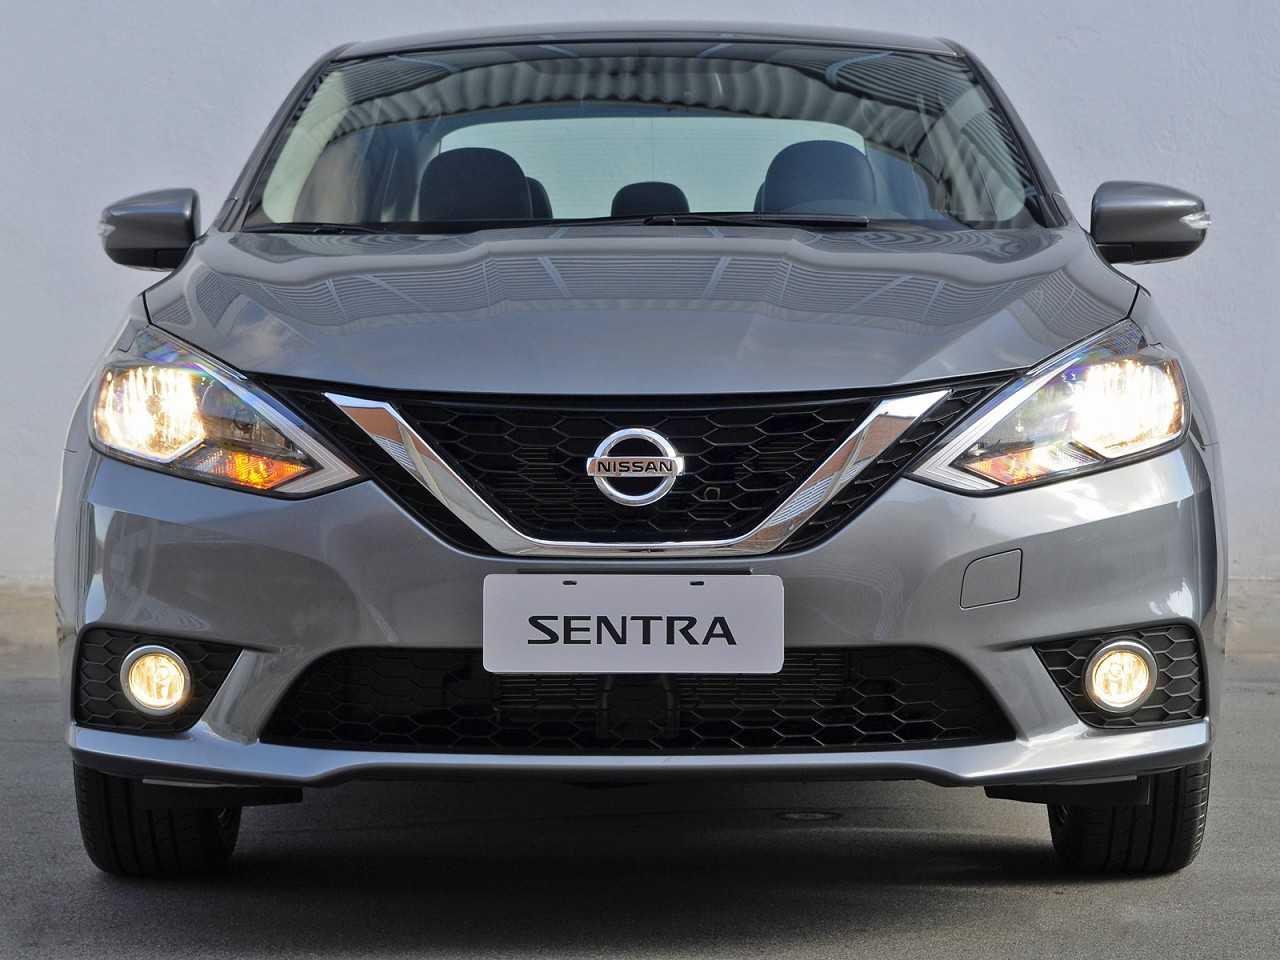 NissanSentra 2017 - frente